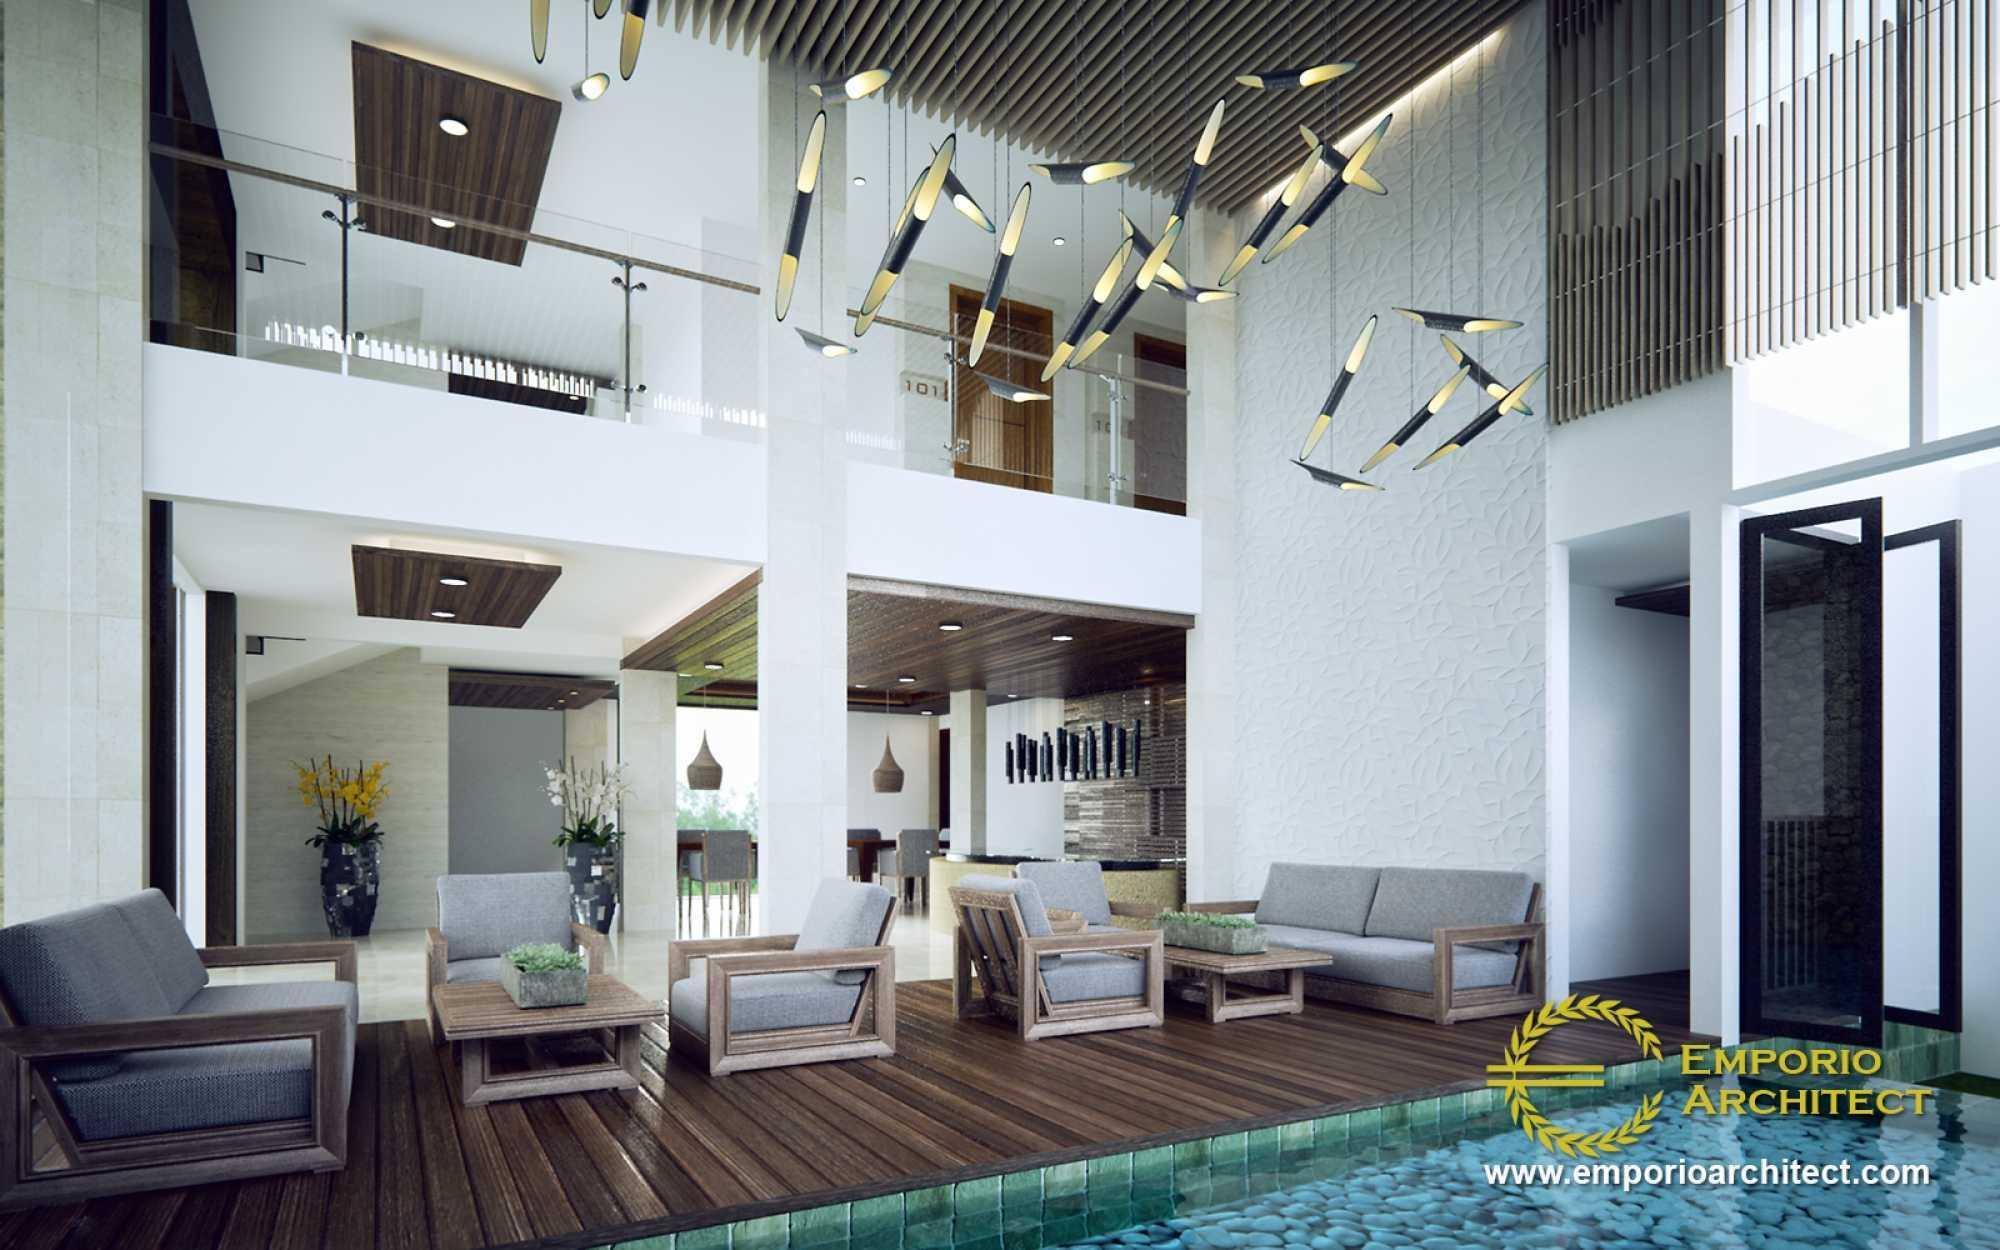 Emporio Architect Desain Hotel Modern Tropis 318 @ Bali Bali, Indonesia Bali, Indonesia Emporio-Architect-Desain-Hotel-Modern-Tropis-318-Bali  73202